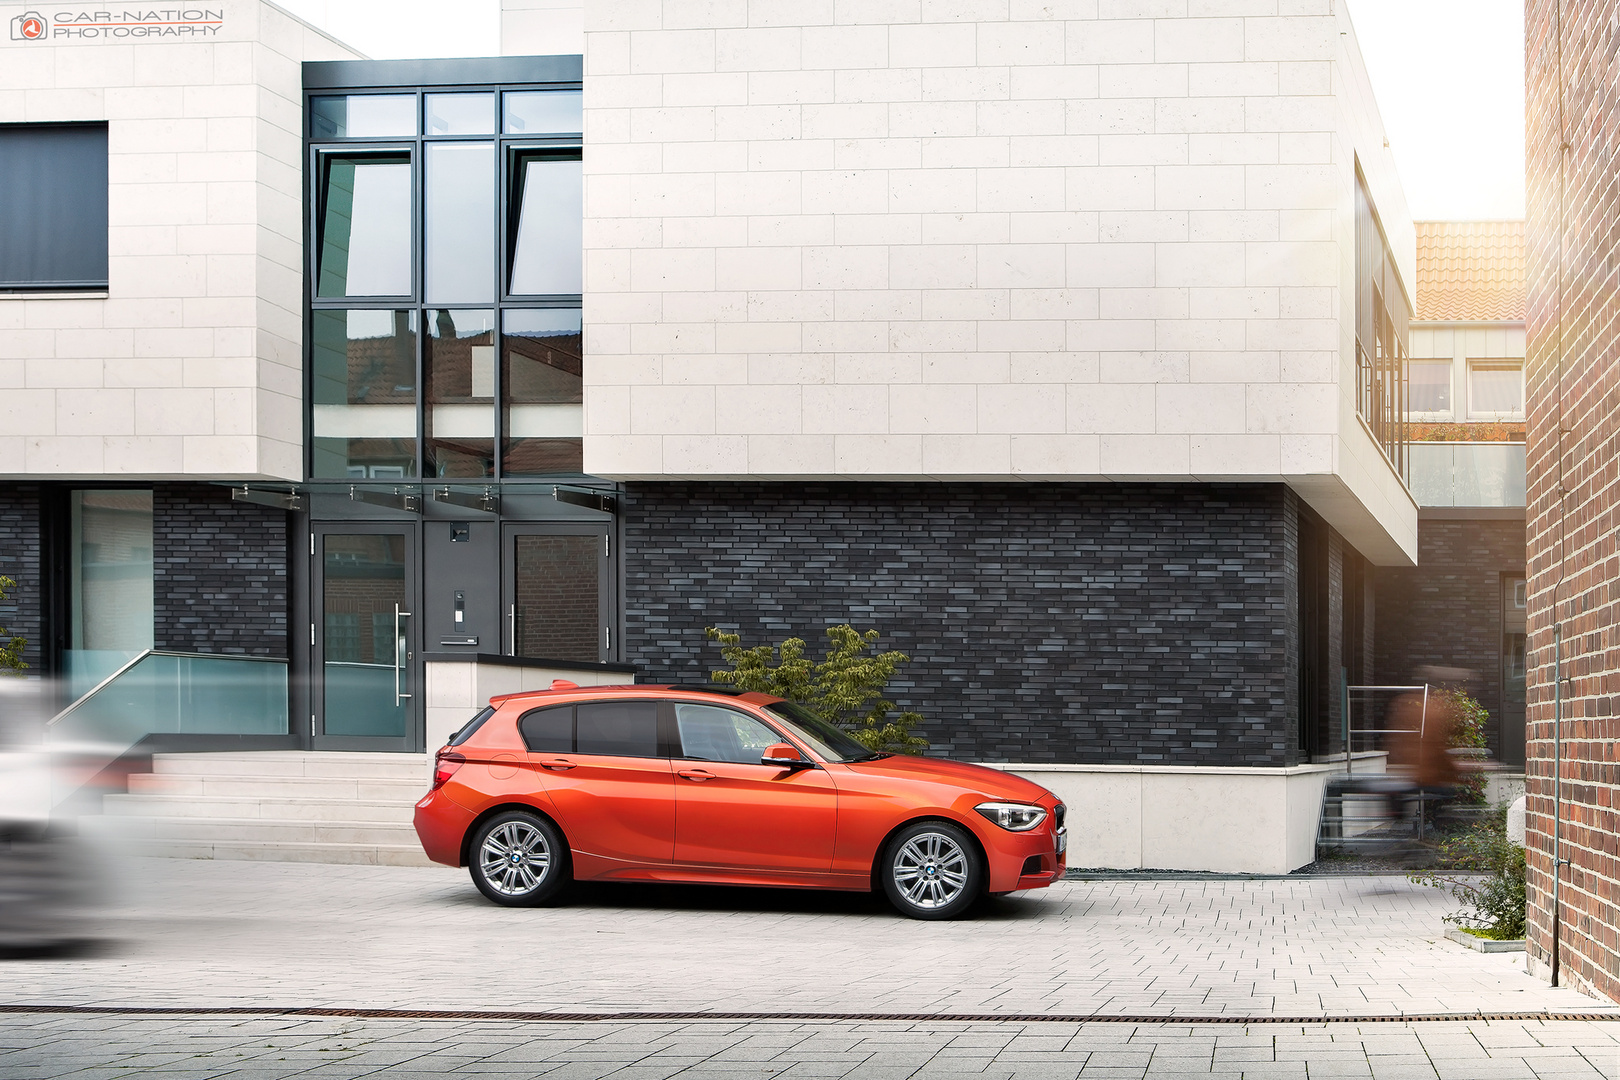 BMW 120d - side